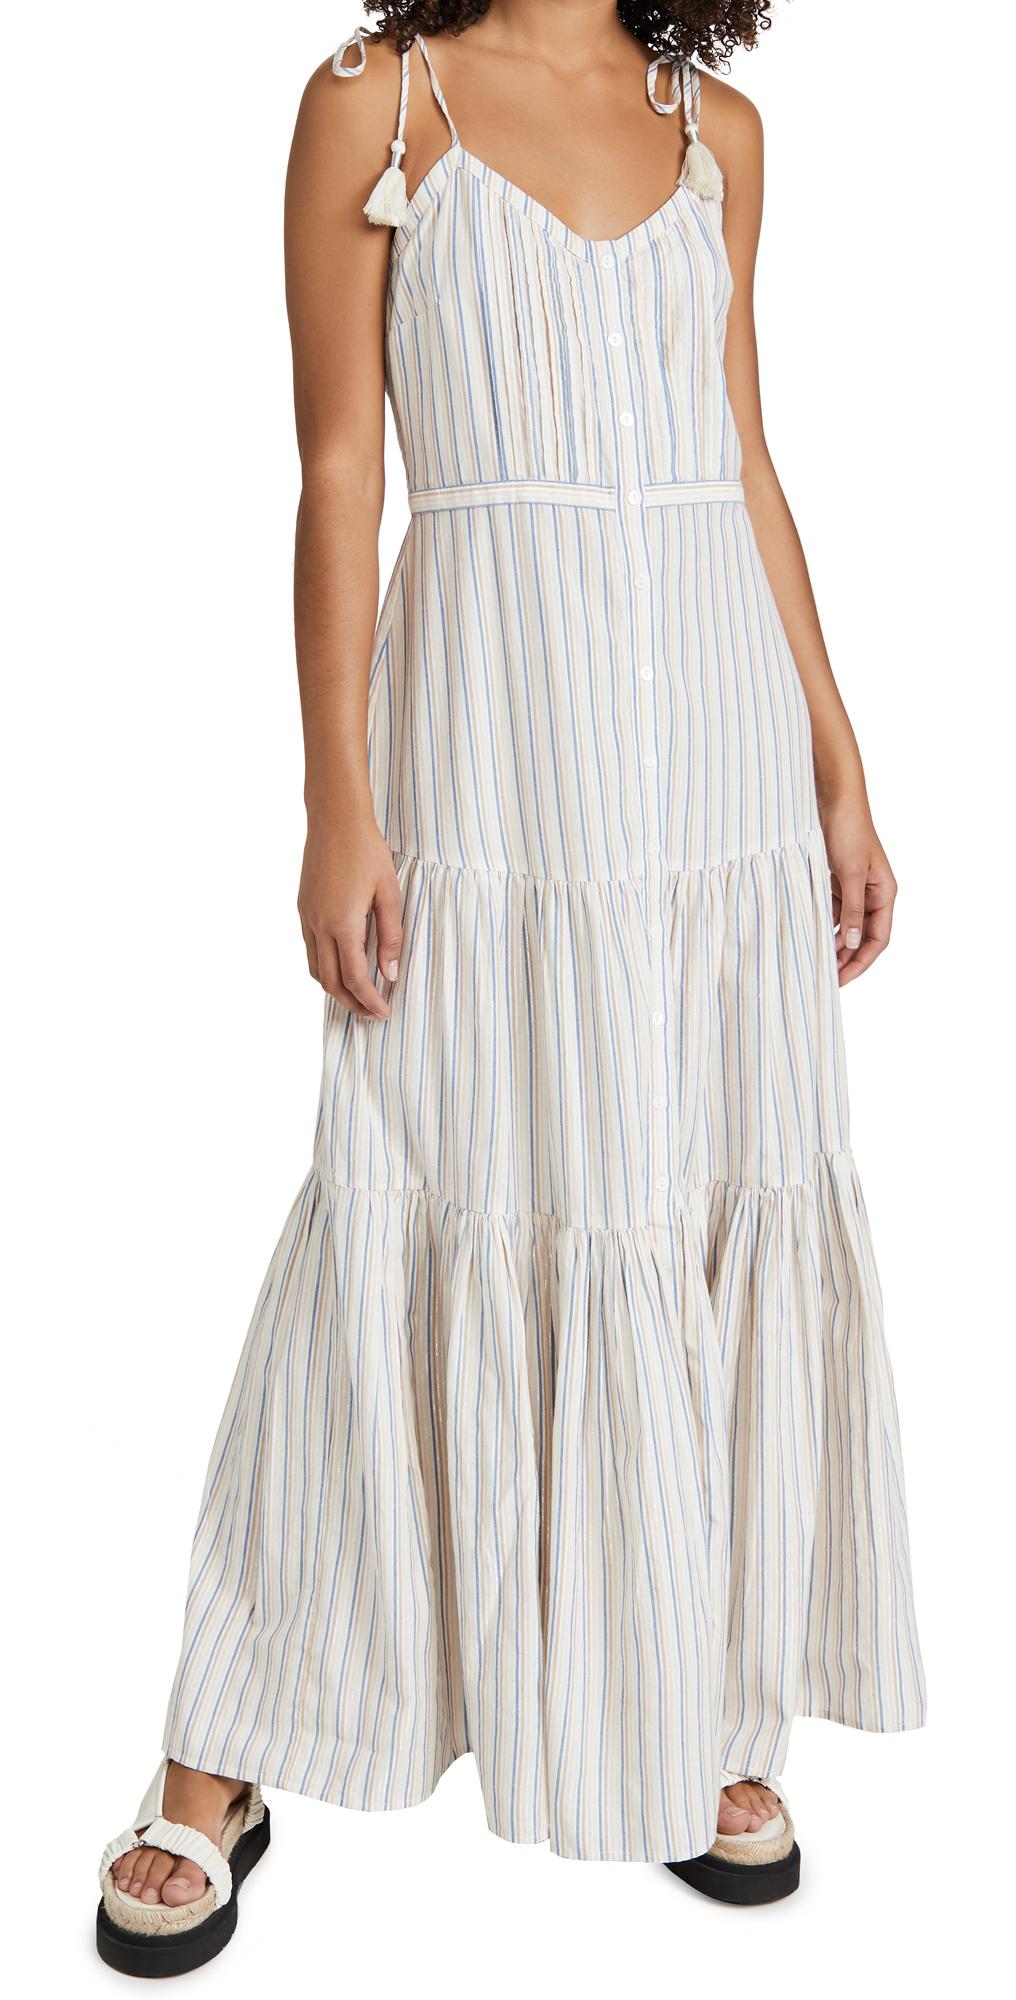 Veronica Beard Windansea Dress